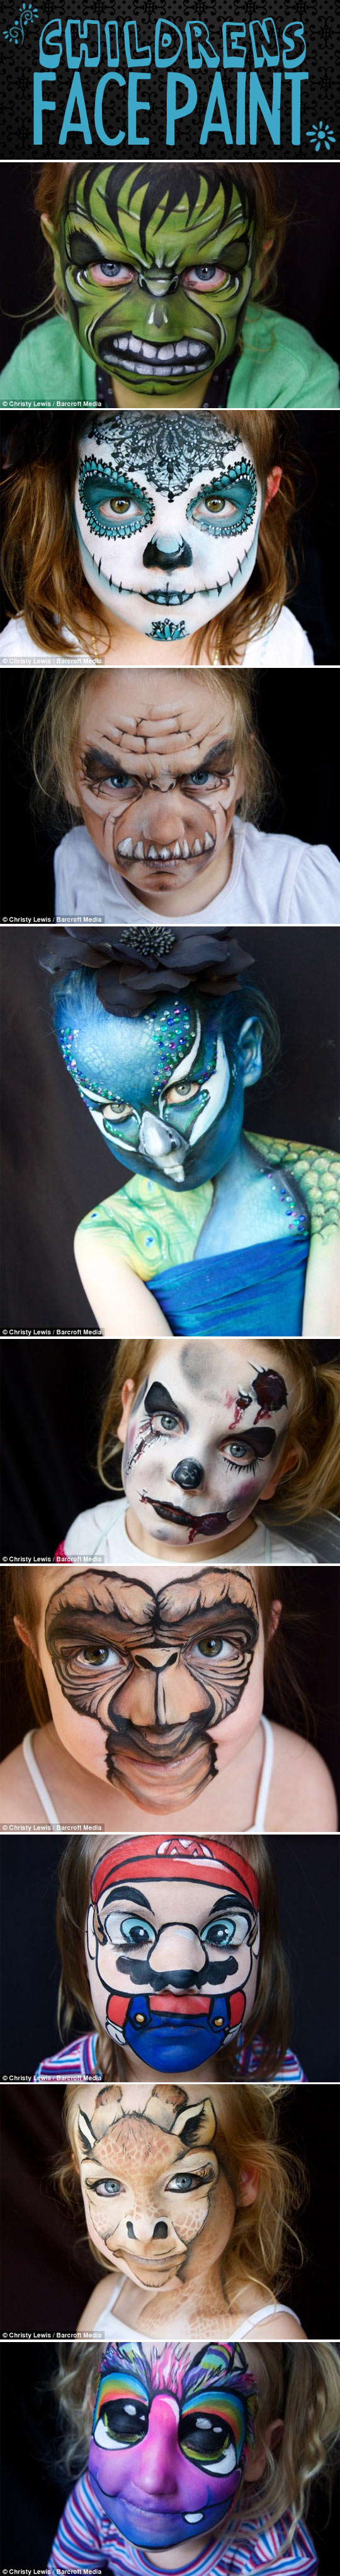 Elaborate children's face make-up…